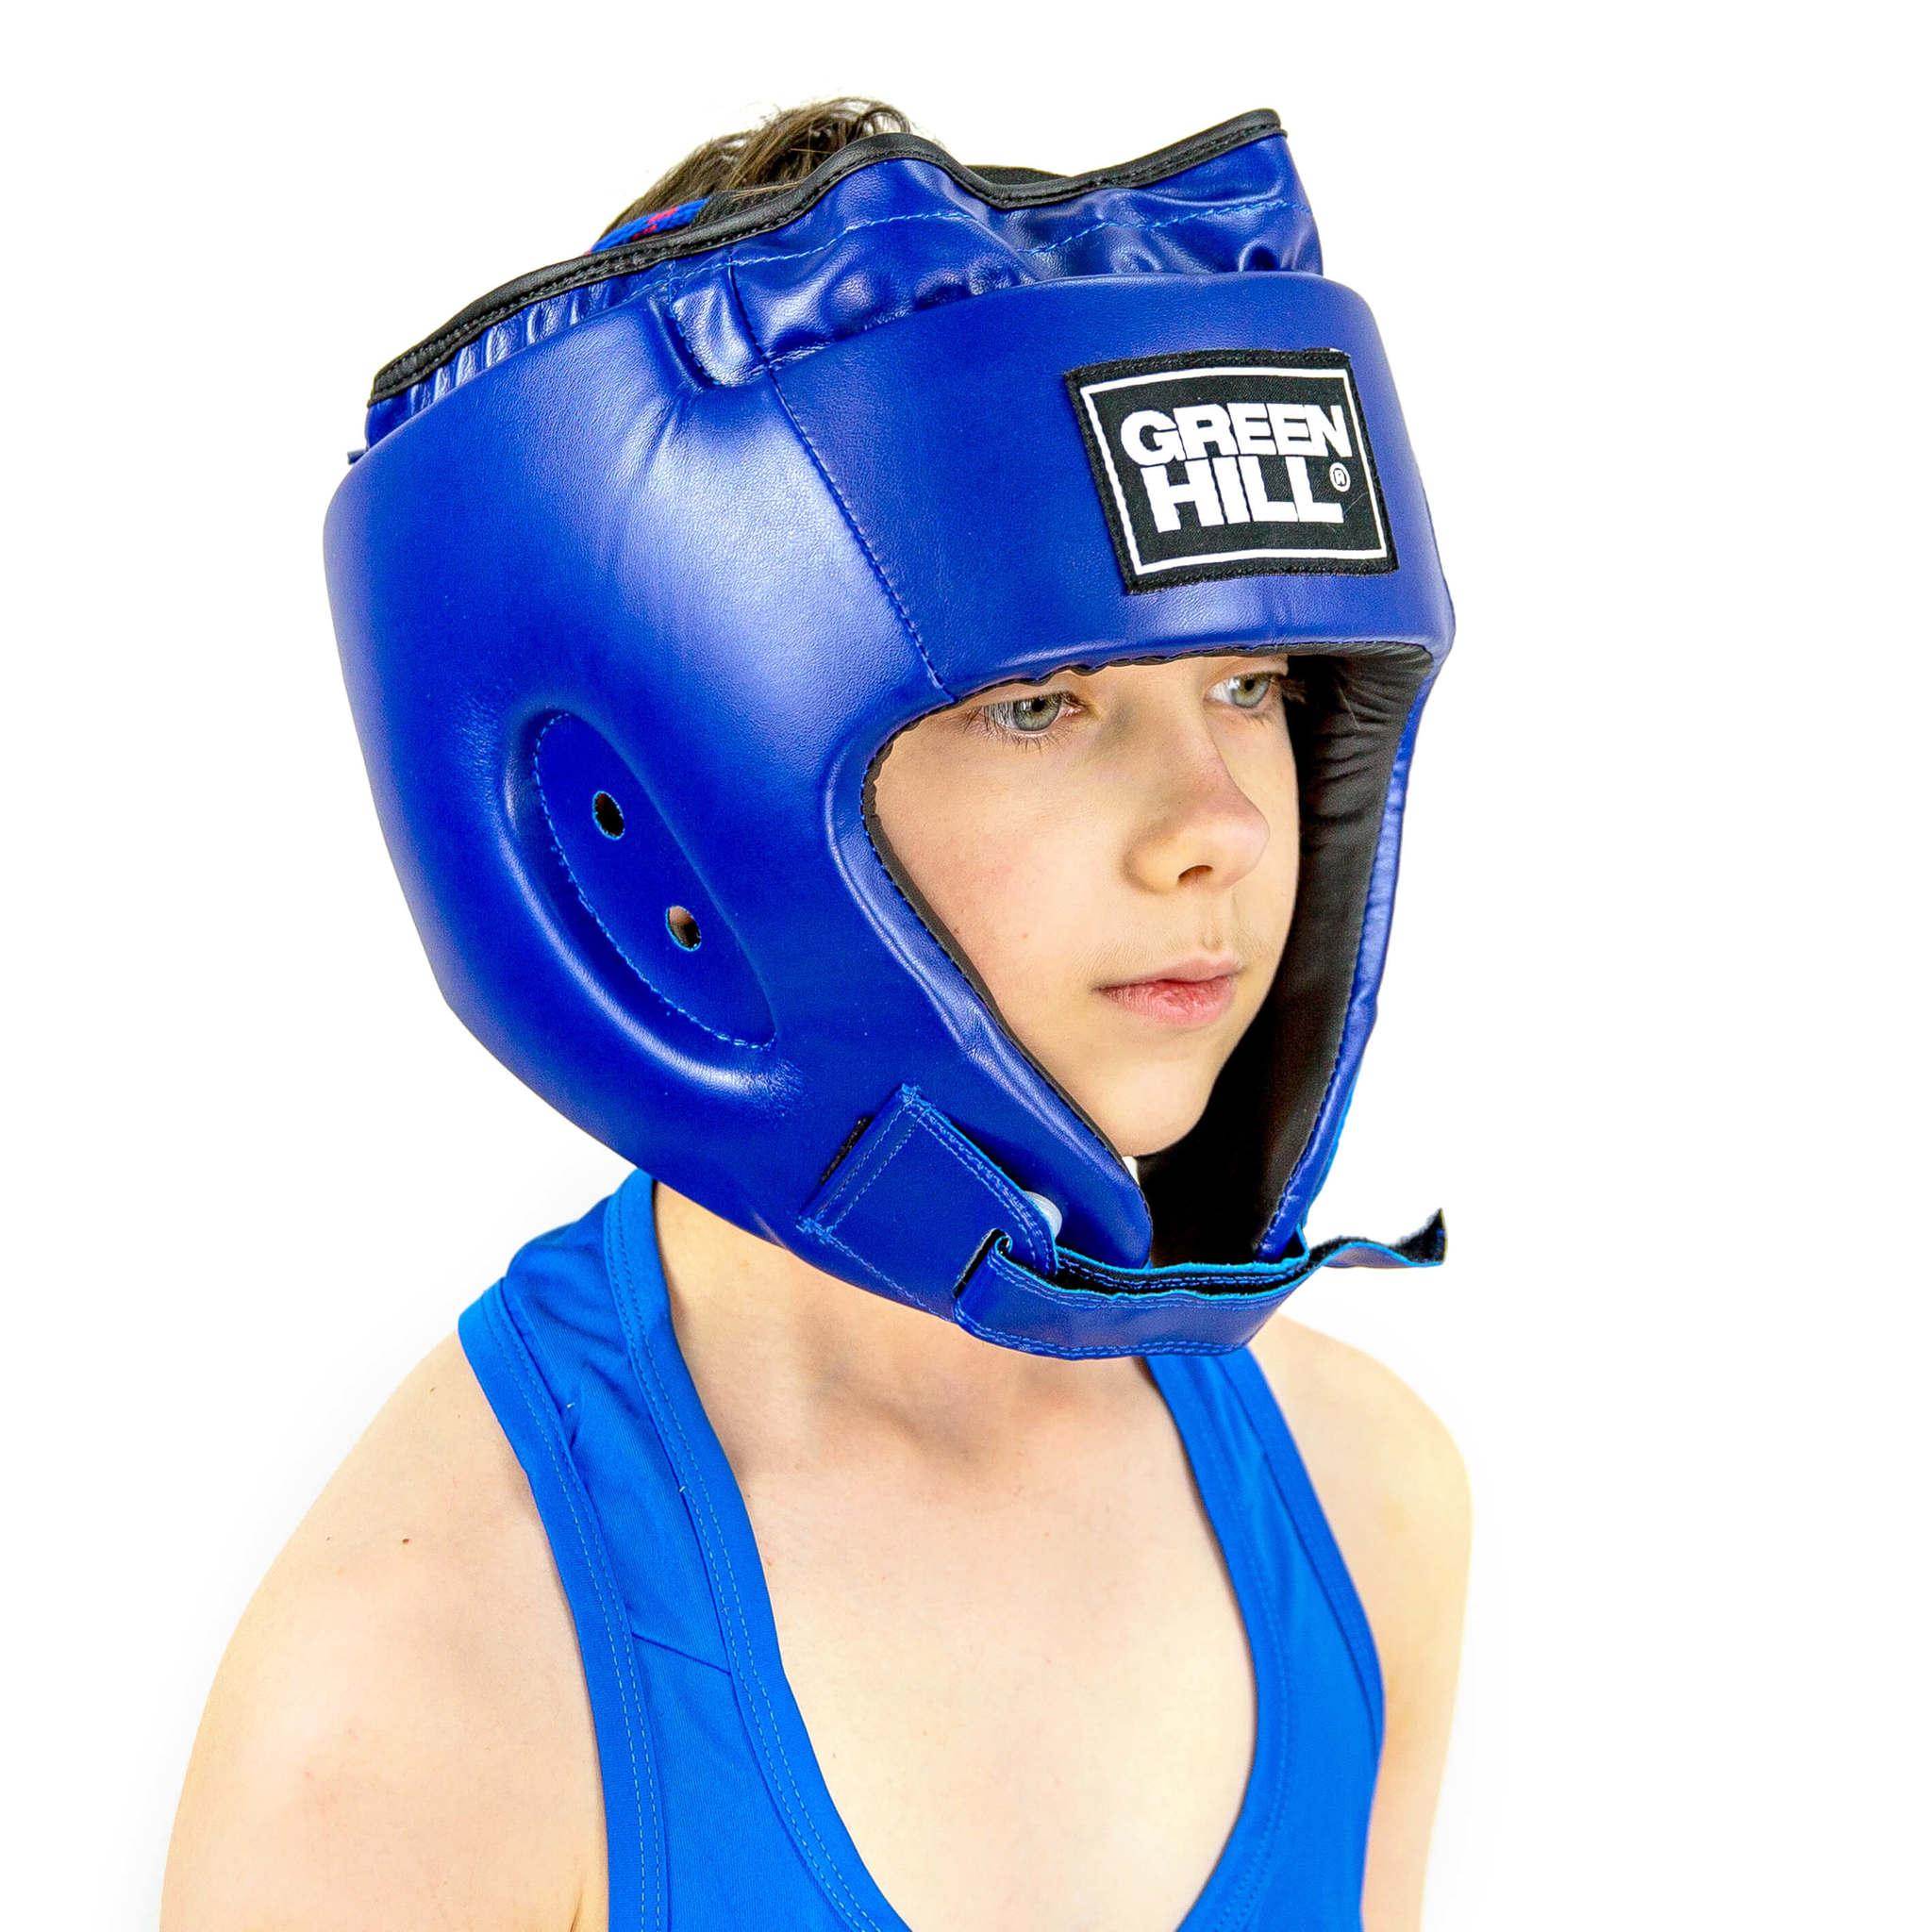 Шлемы Шлем для боевого самбо Alfa HGA-4014 Green Hill 5L9A00545L9A0054_1.jpg